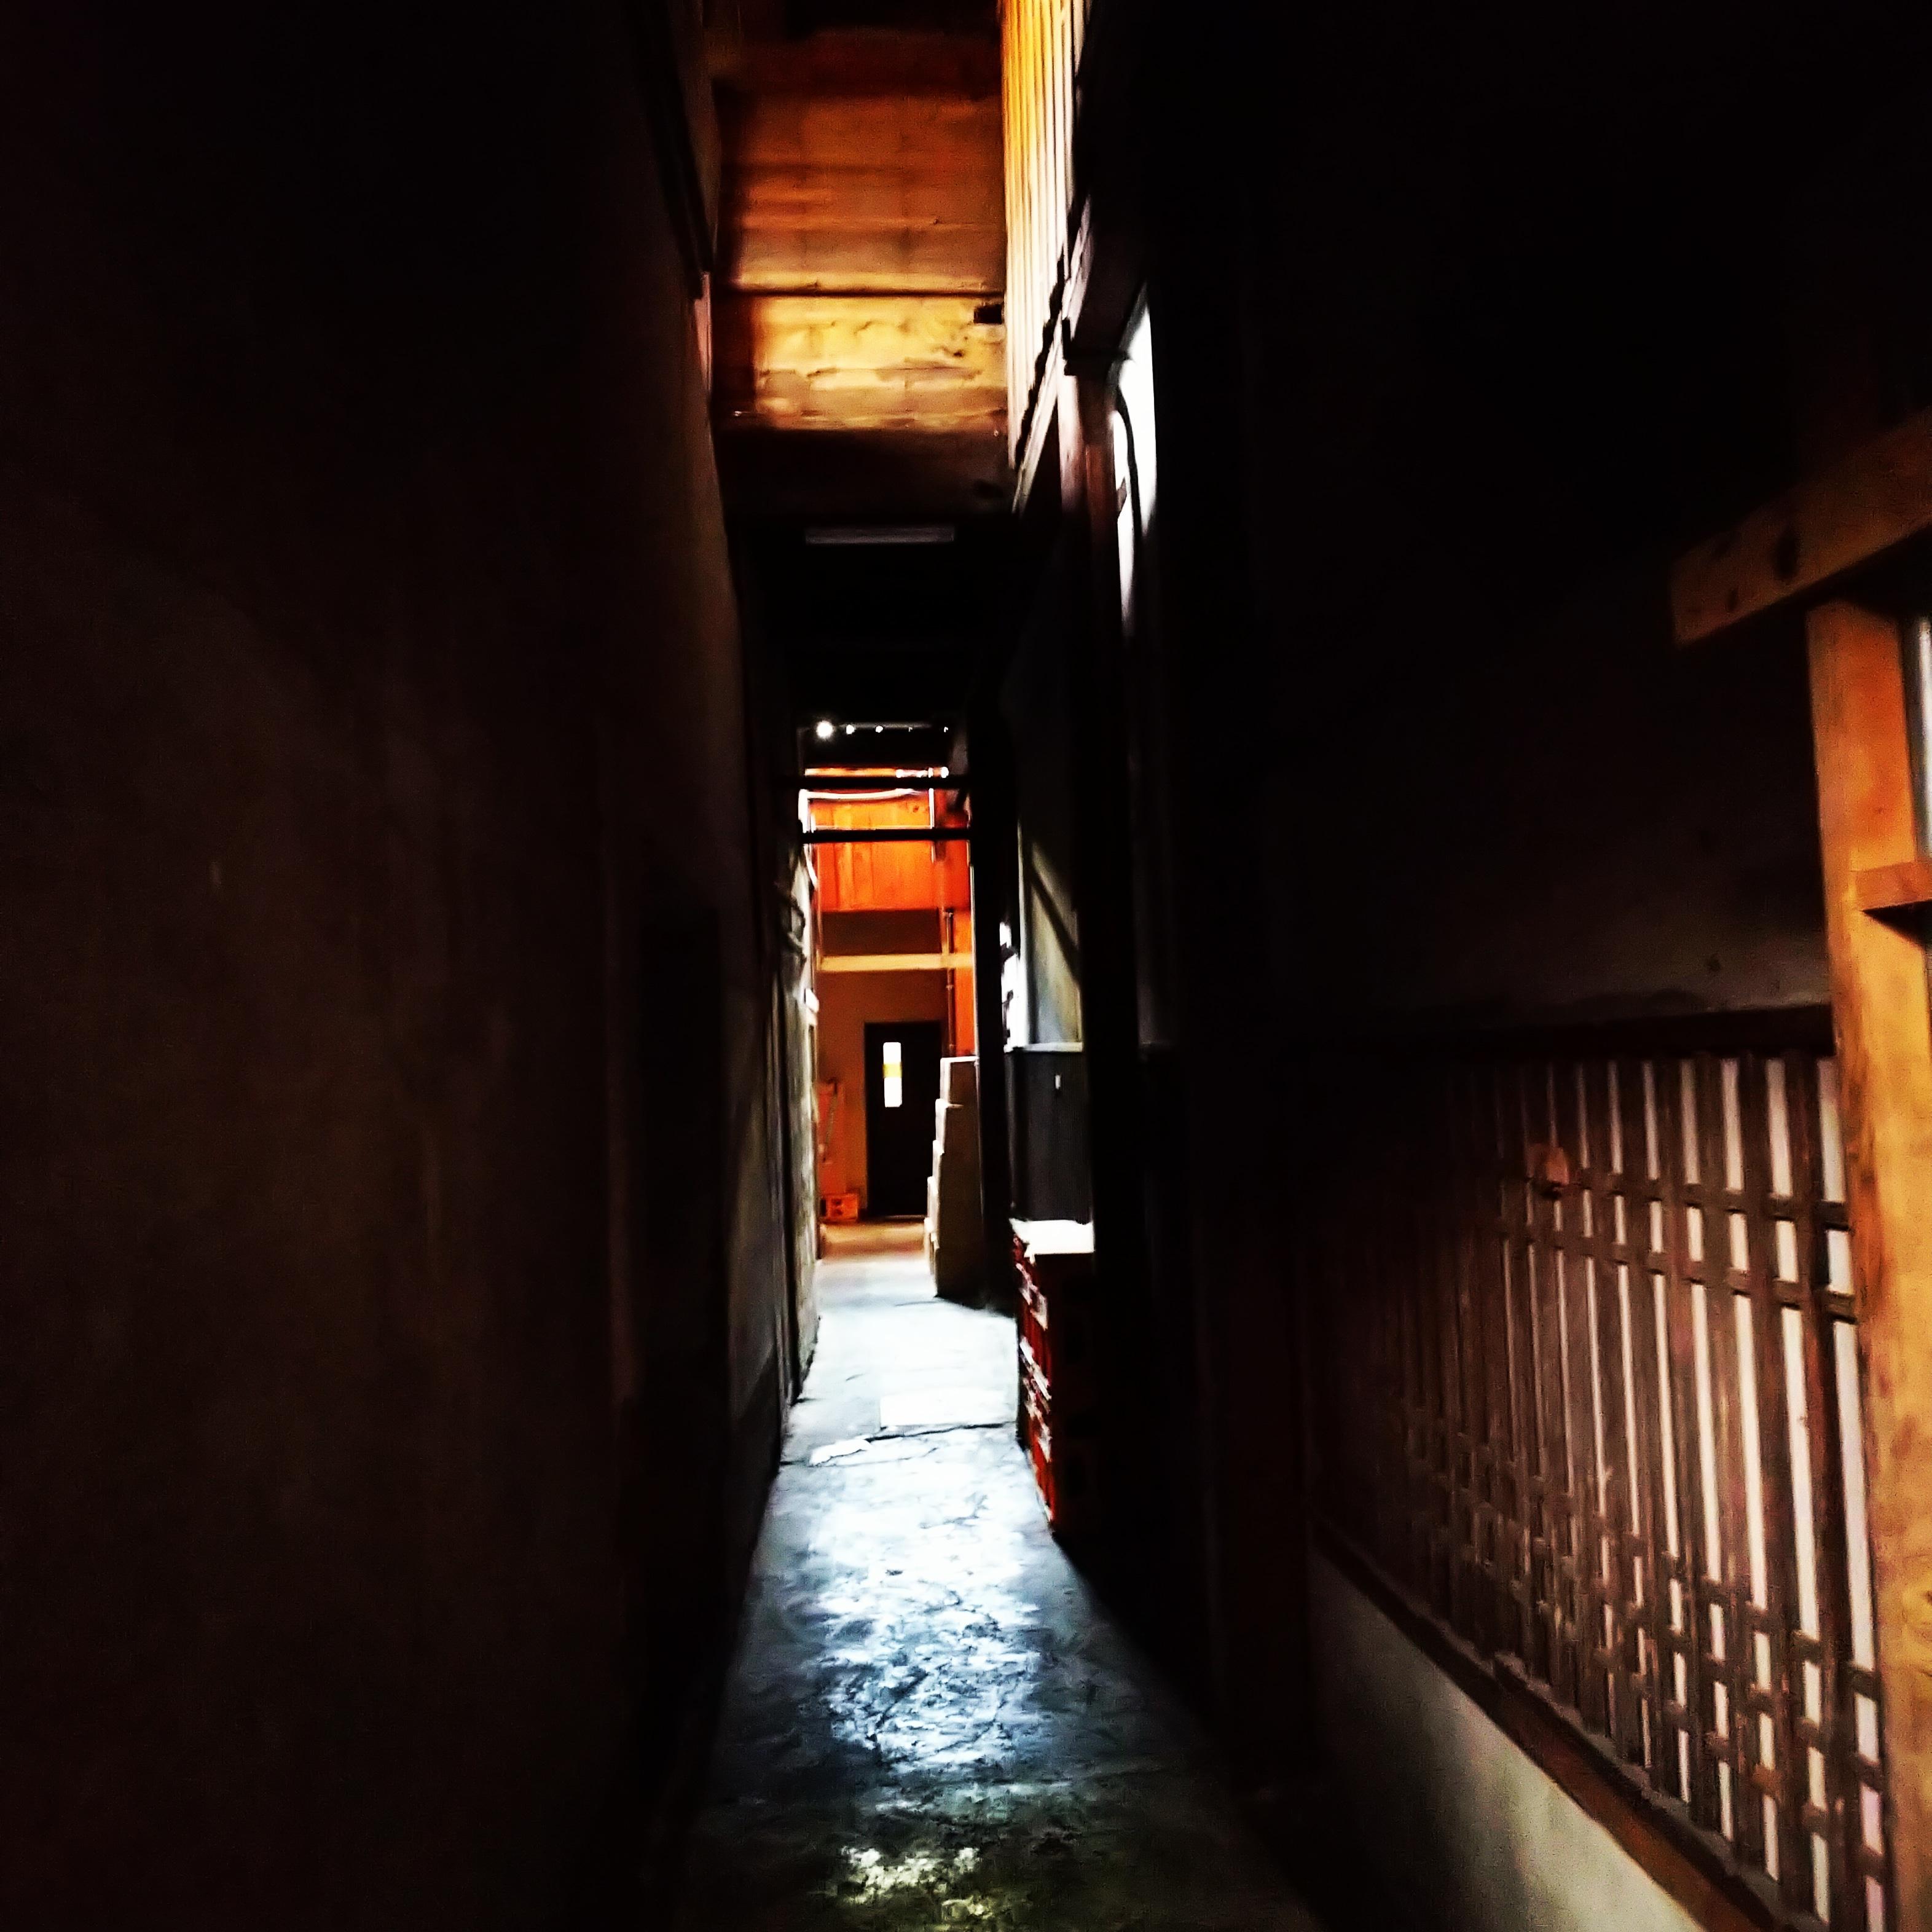 http://www.fukukomachi.com/blog/photo/IMG_20201002_195200_405.jpg